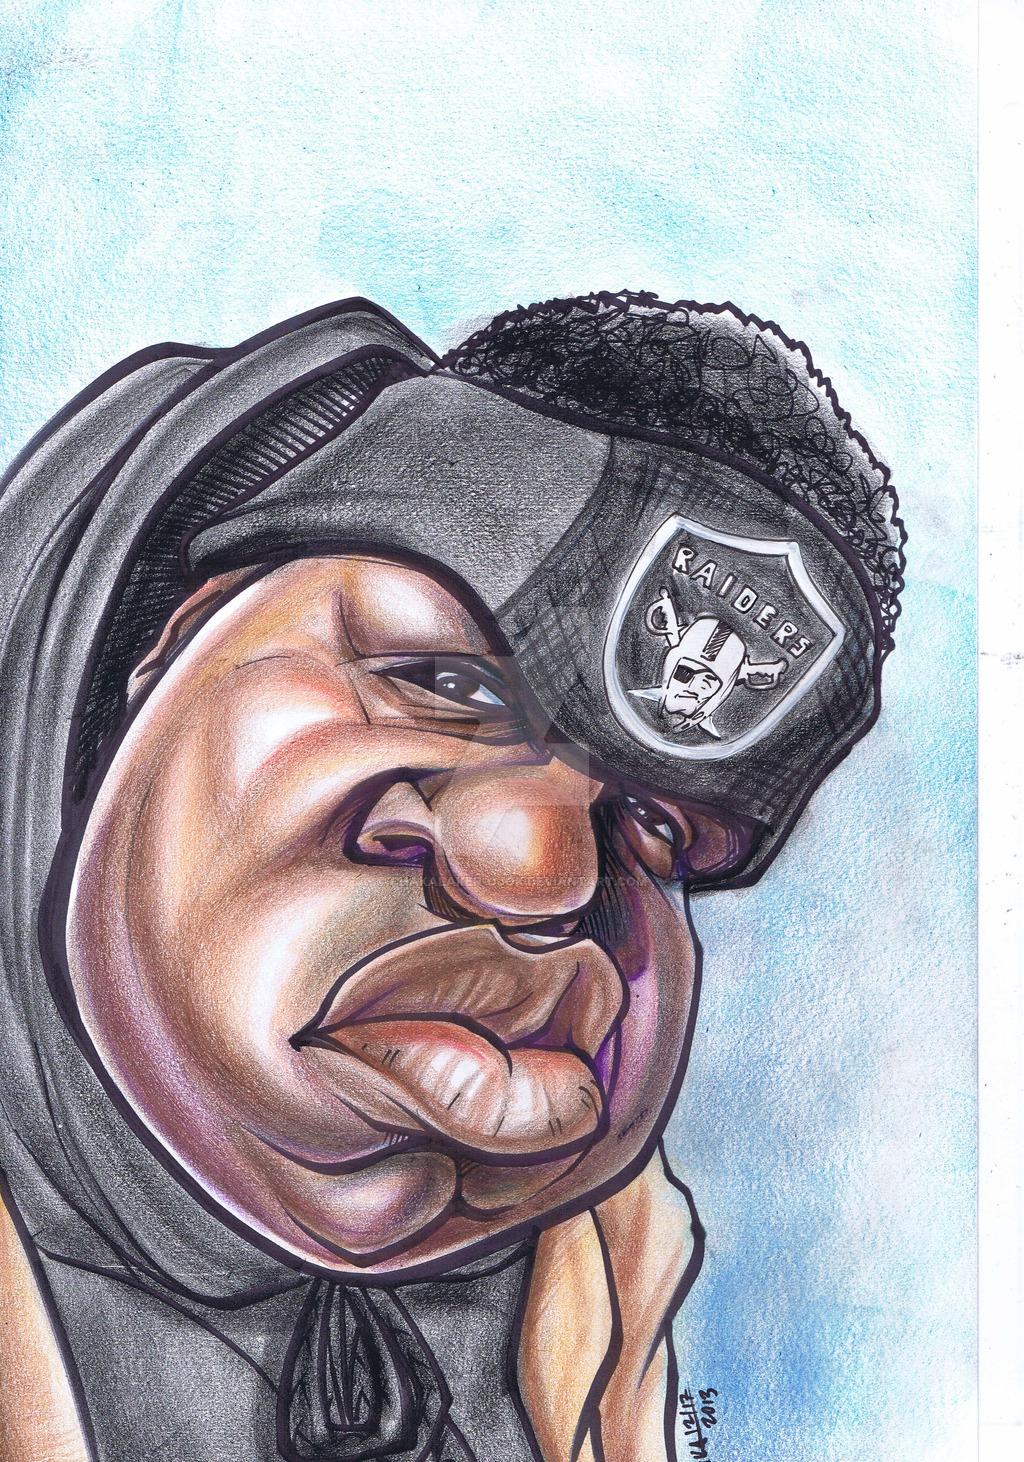 1024x1462 The Notorious B.i.g [Caricature] By Chakalaker Ojok